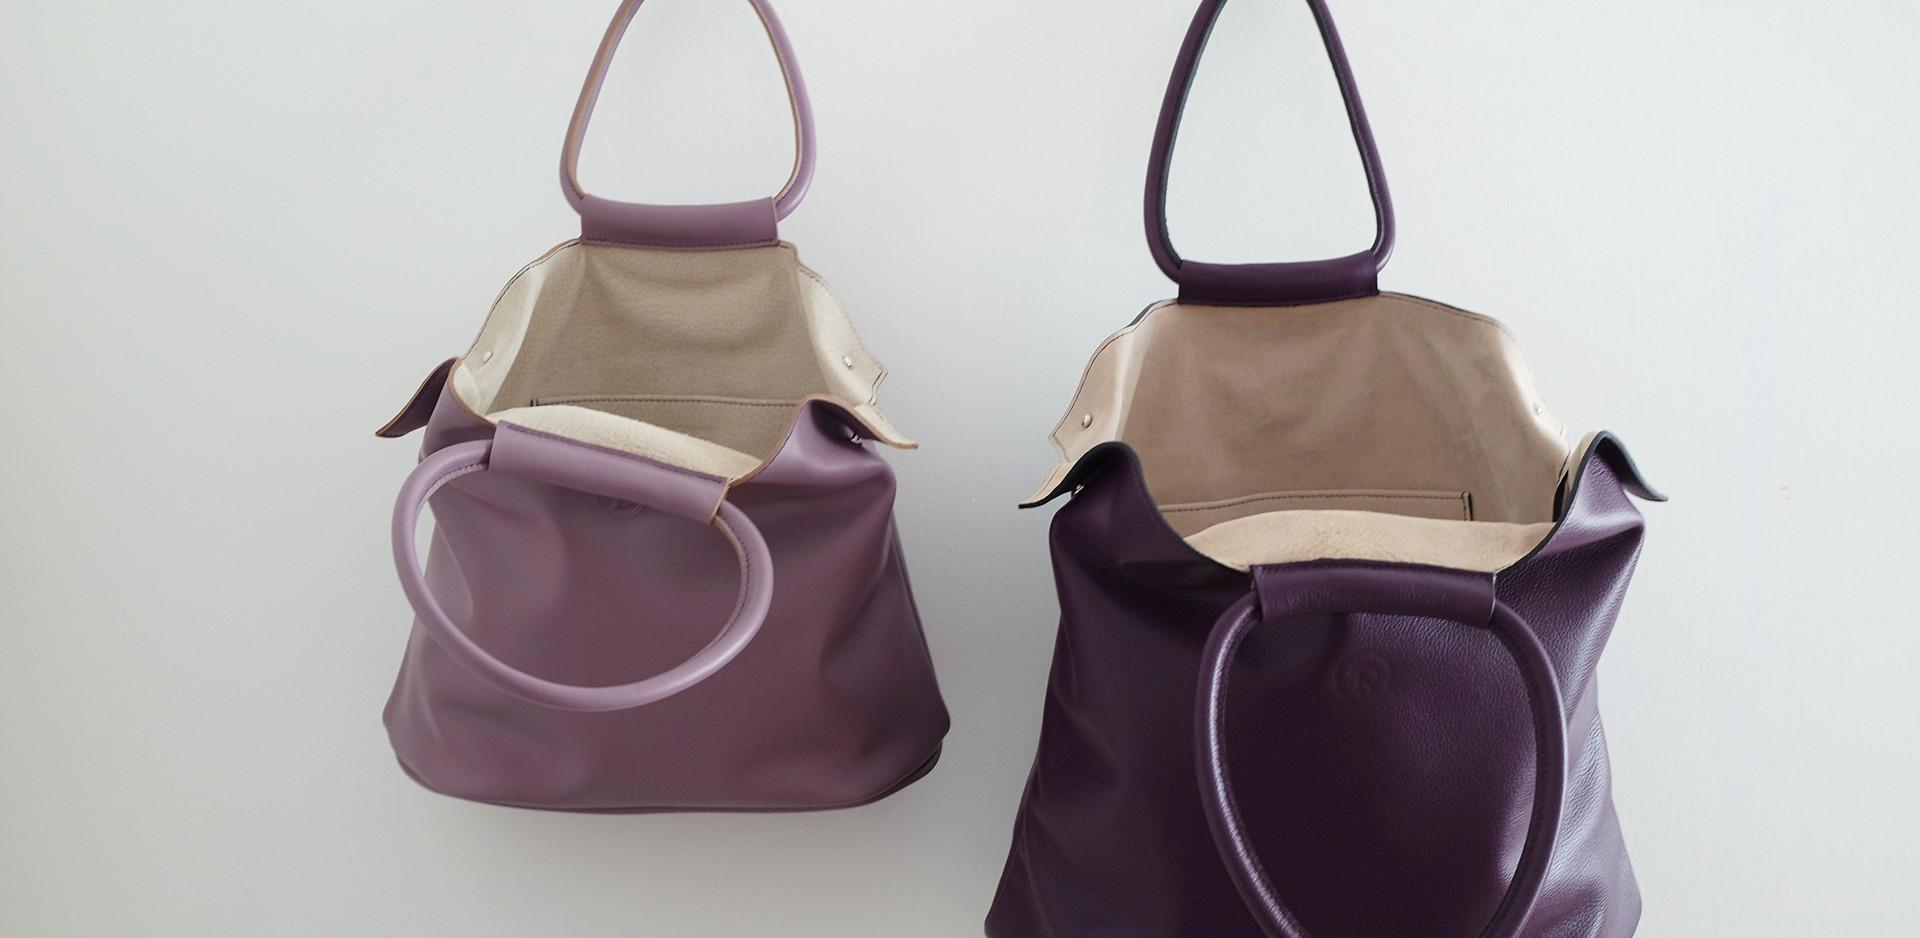 Tandem far ( petit modèle ) - Tandem violet ( grand modèle )